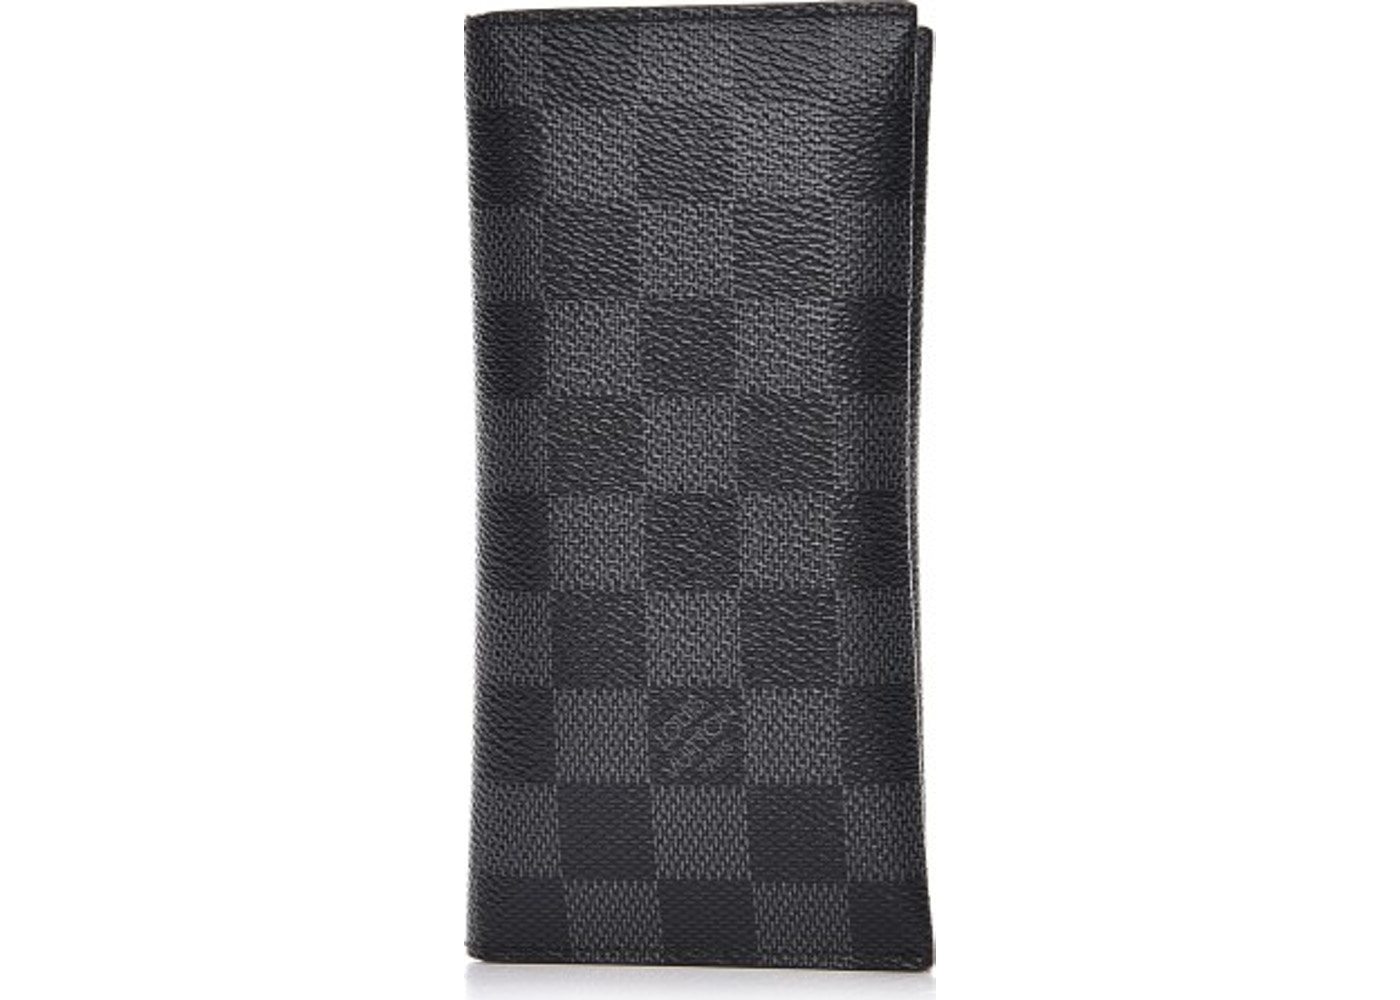 27ed5649540a Louis Vuitton Card Holder Damier Graphite. Damier Graphite